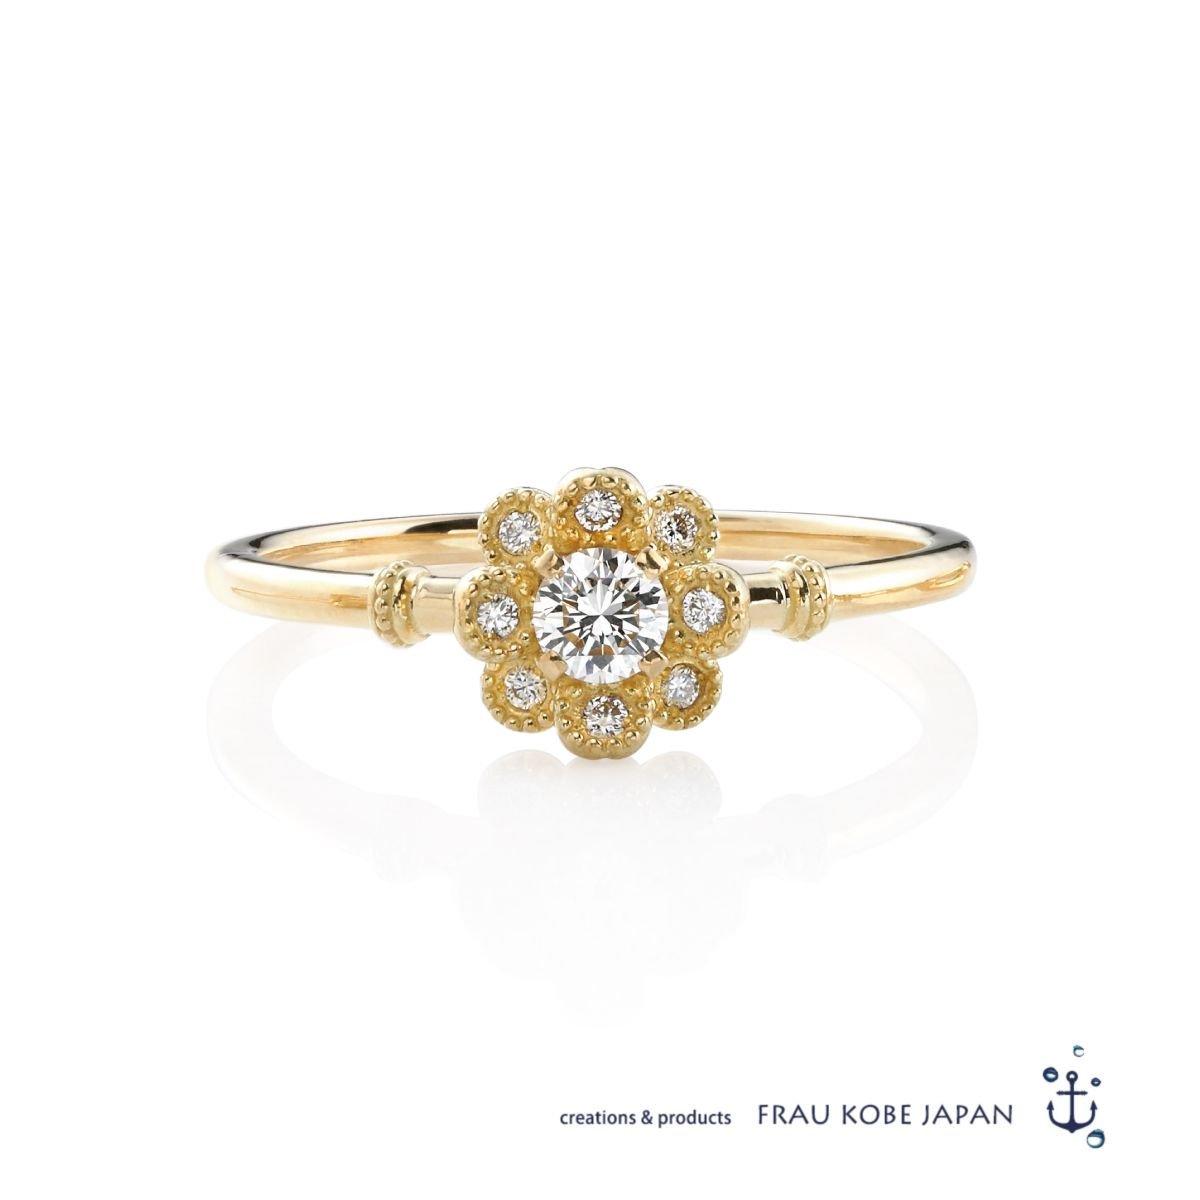 「PEONY/ピオニー」 ダイアモンドリング(K18)